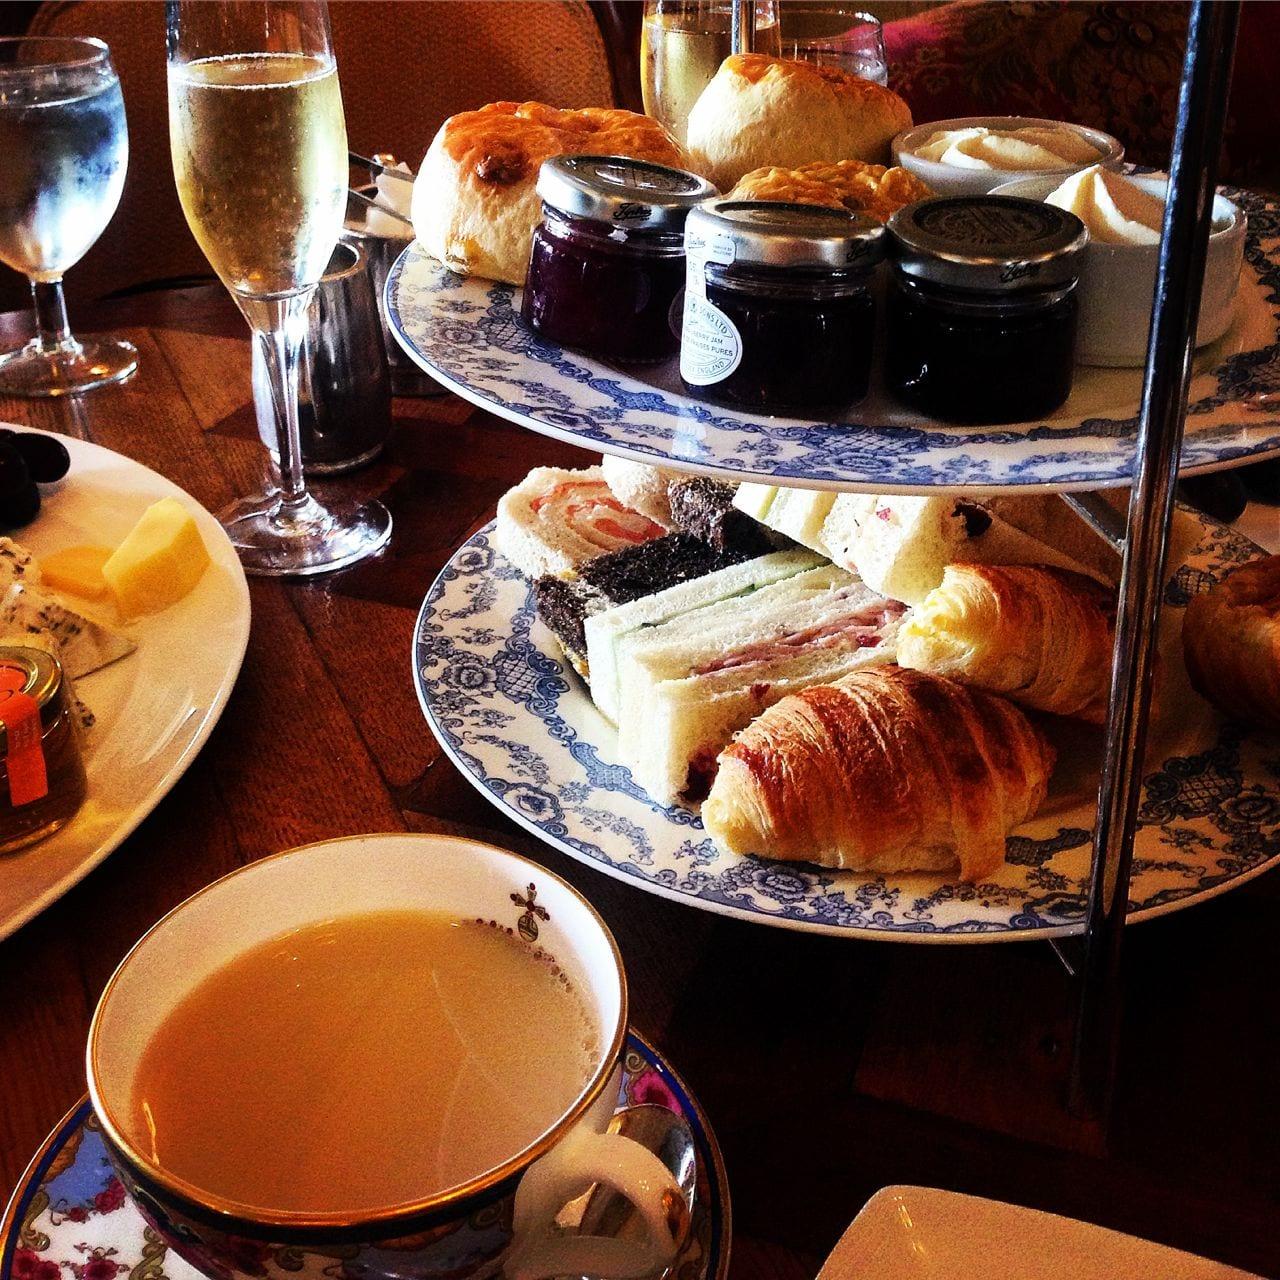 Afternoon Tea at the Fairmont Empress Victoria